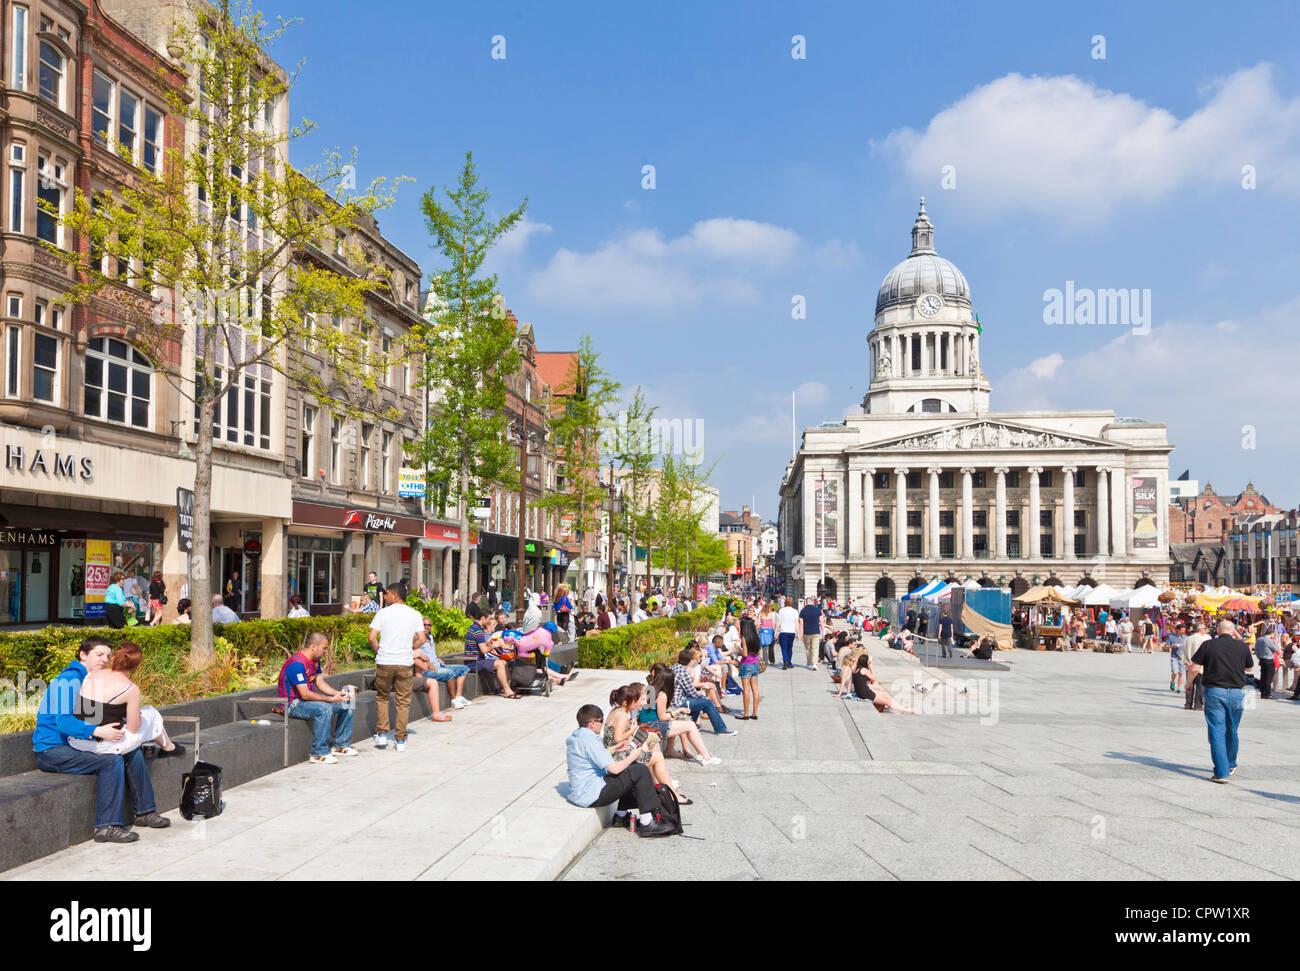 Council House in old Nottingham Market Square Nottingham city centre Nottinghamshire England GB UK Europe - Stock Image